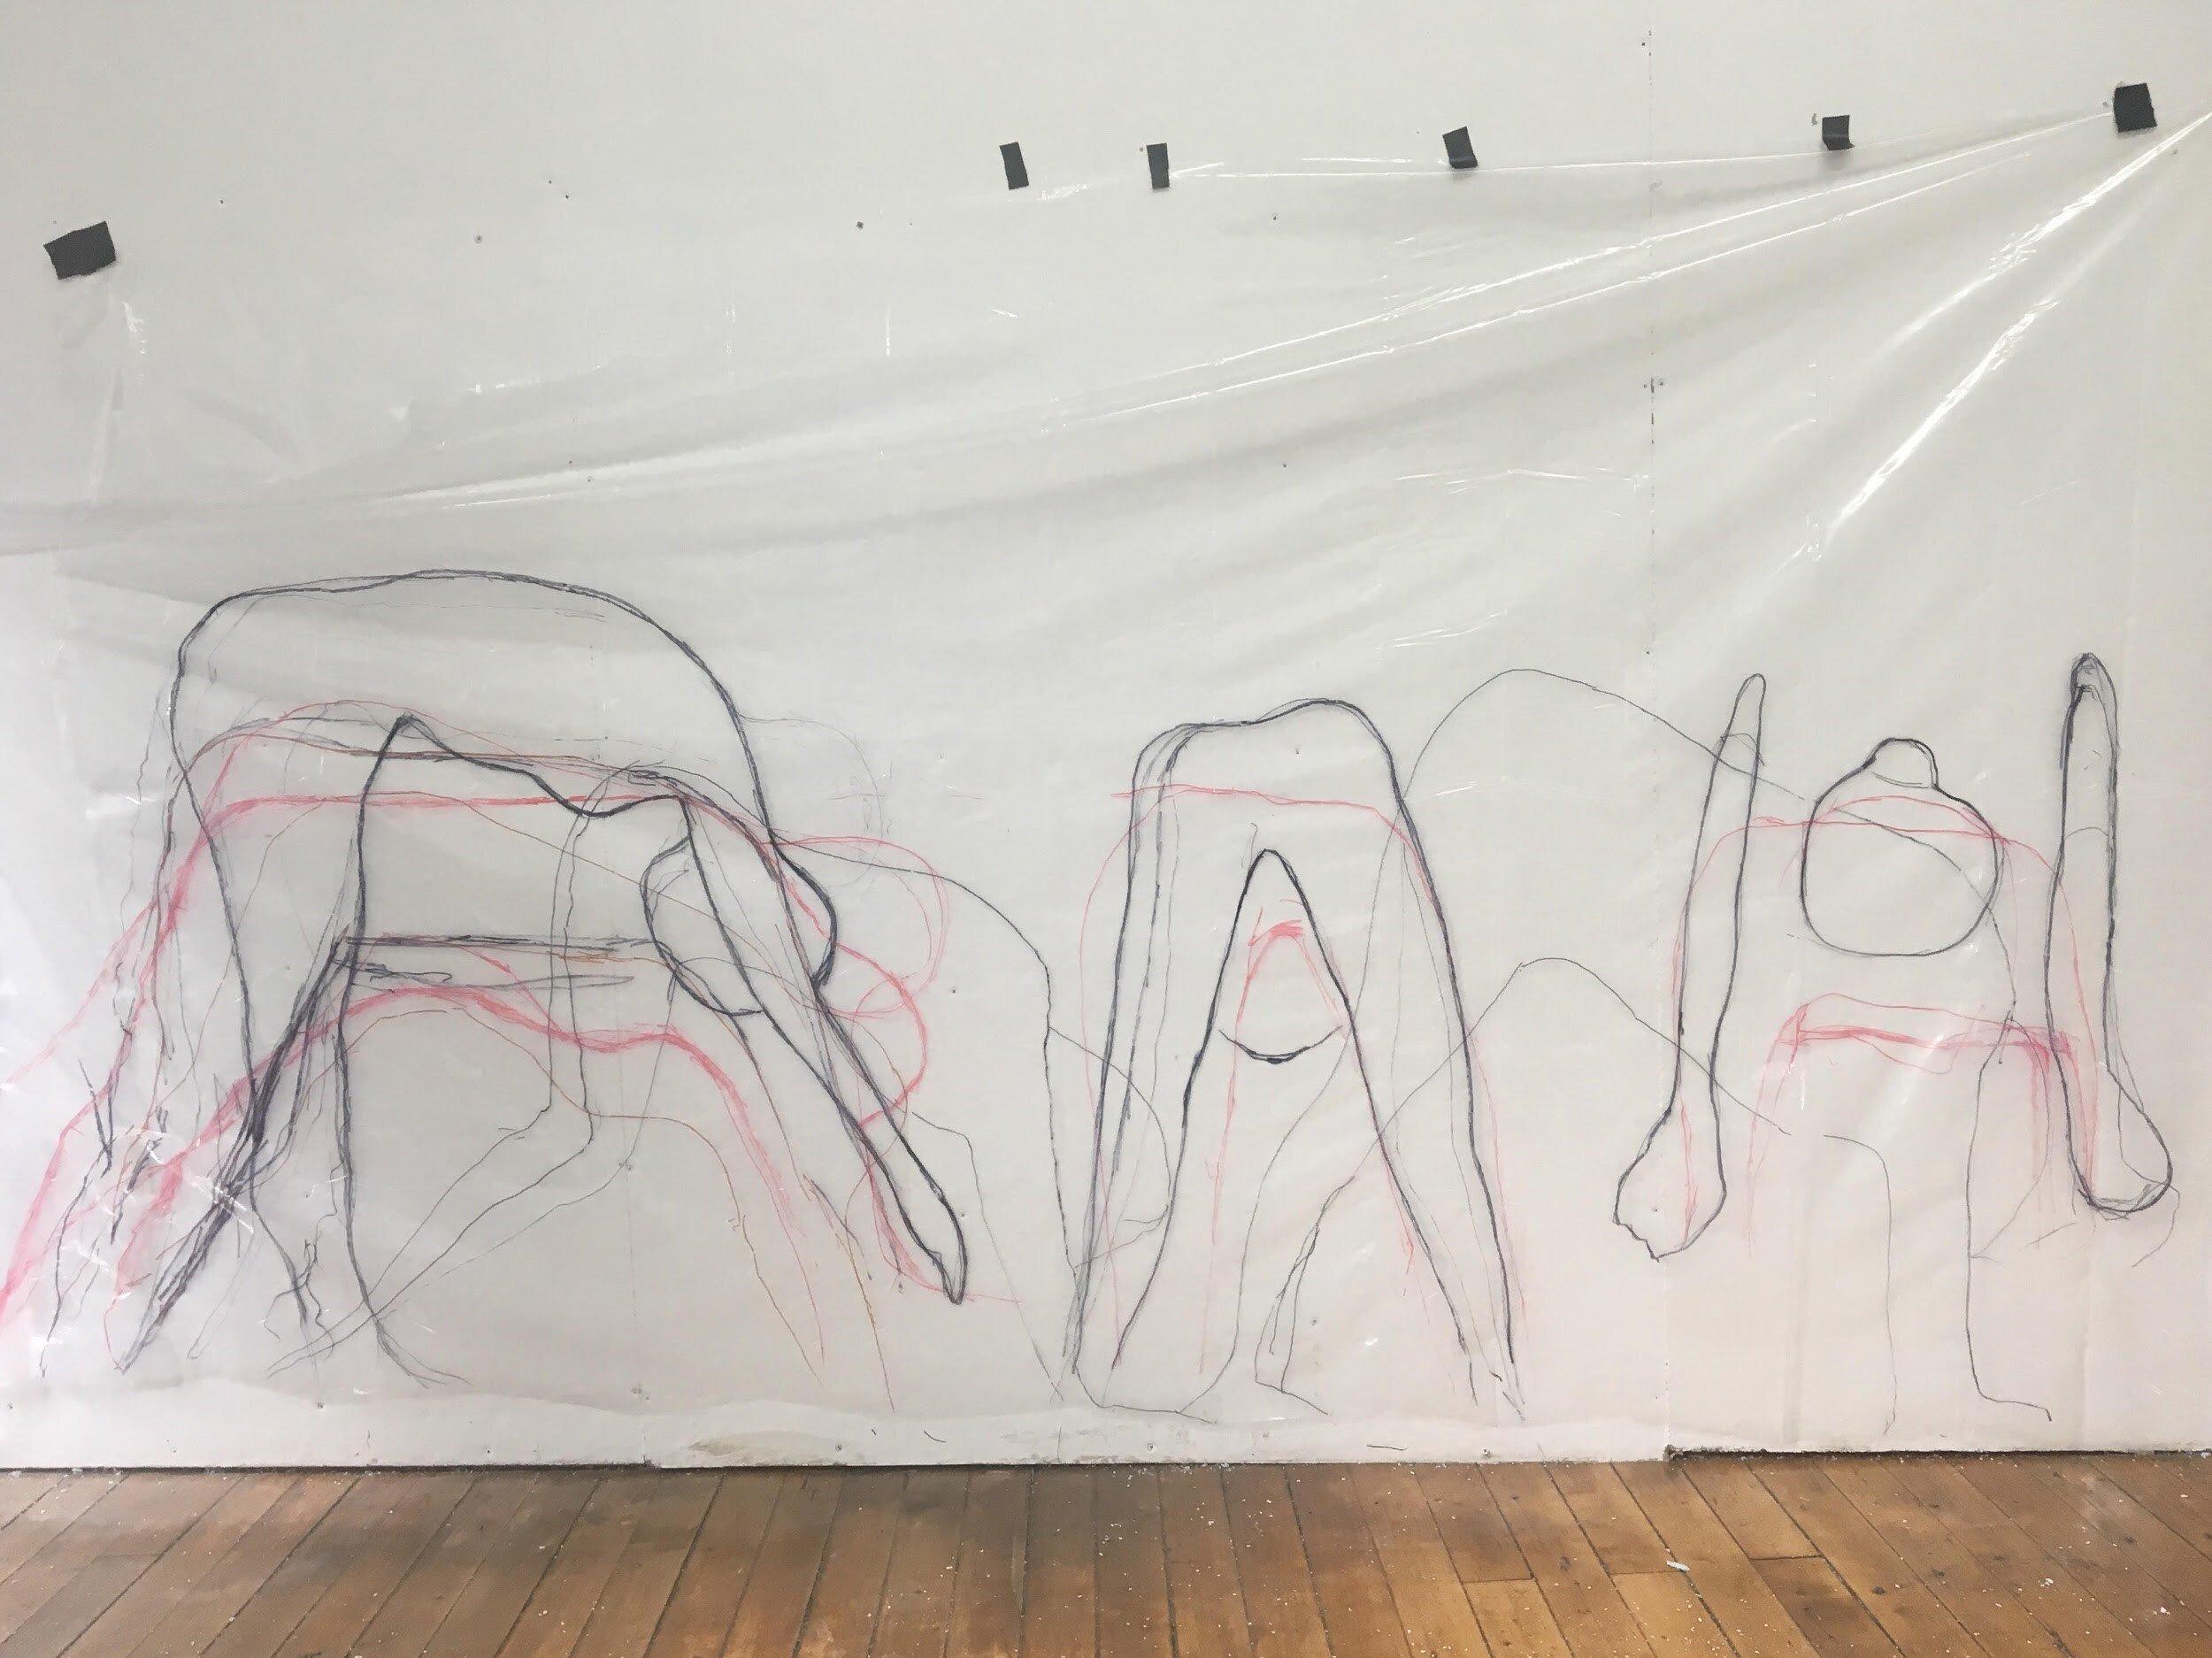 Work in progress in the studio